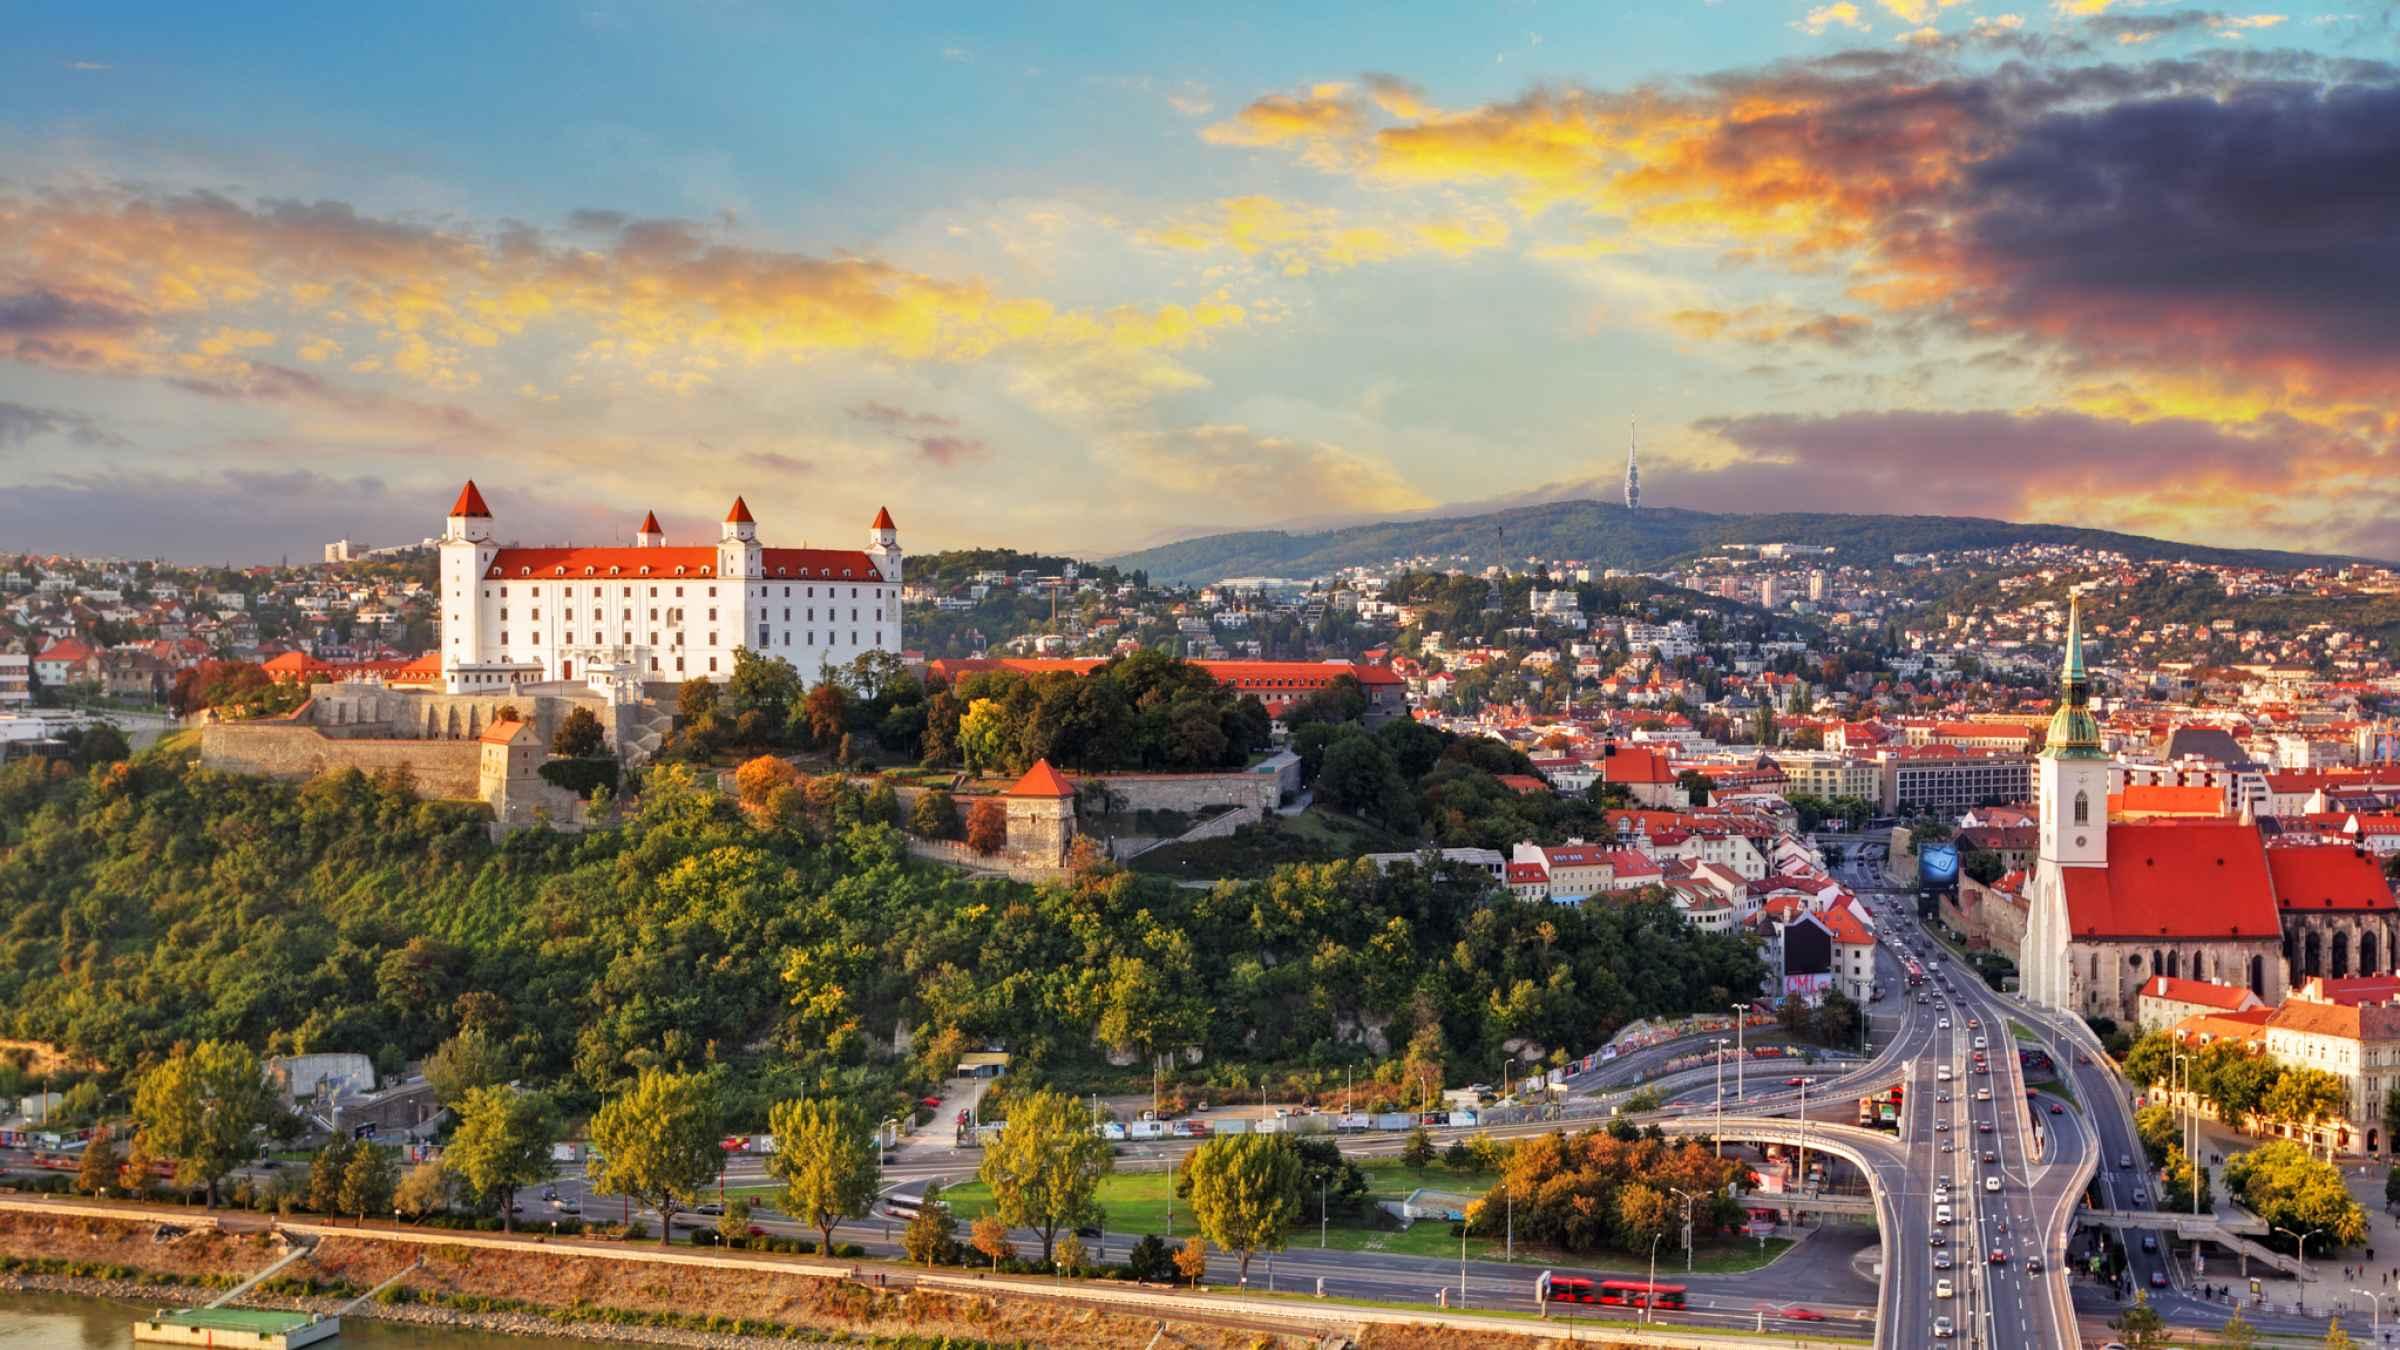 Old Bridge, Bratislava, Bratislava - Book Tickets & Tours | GetYourGuide.com